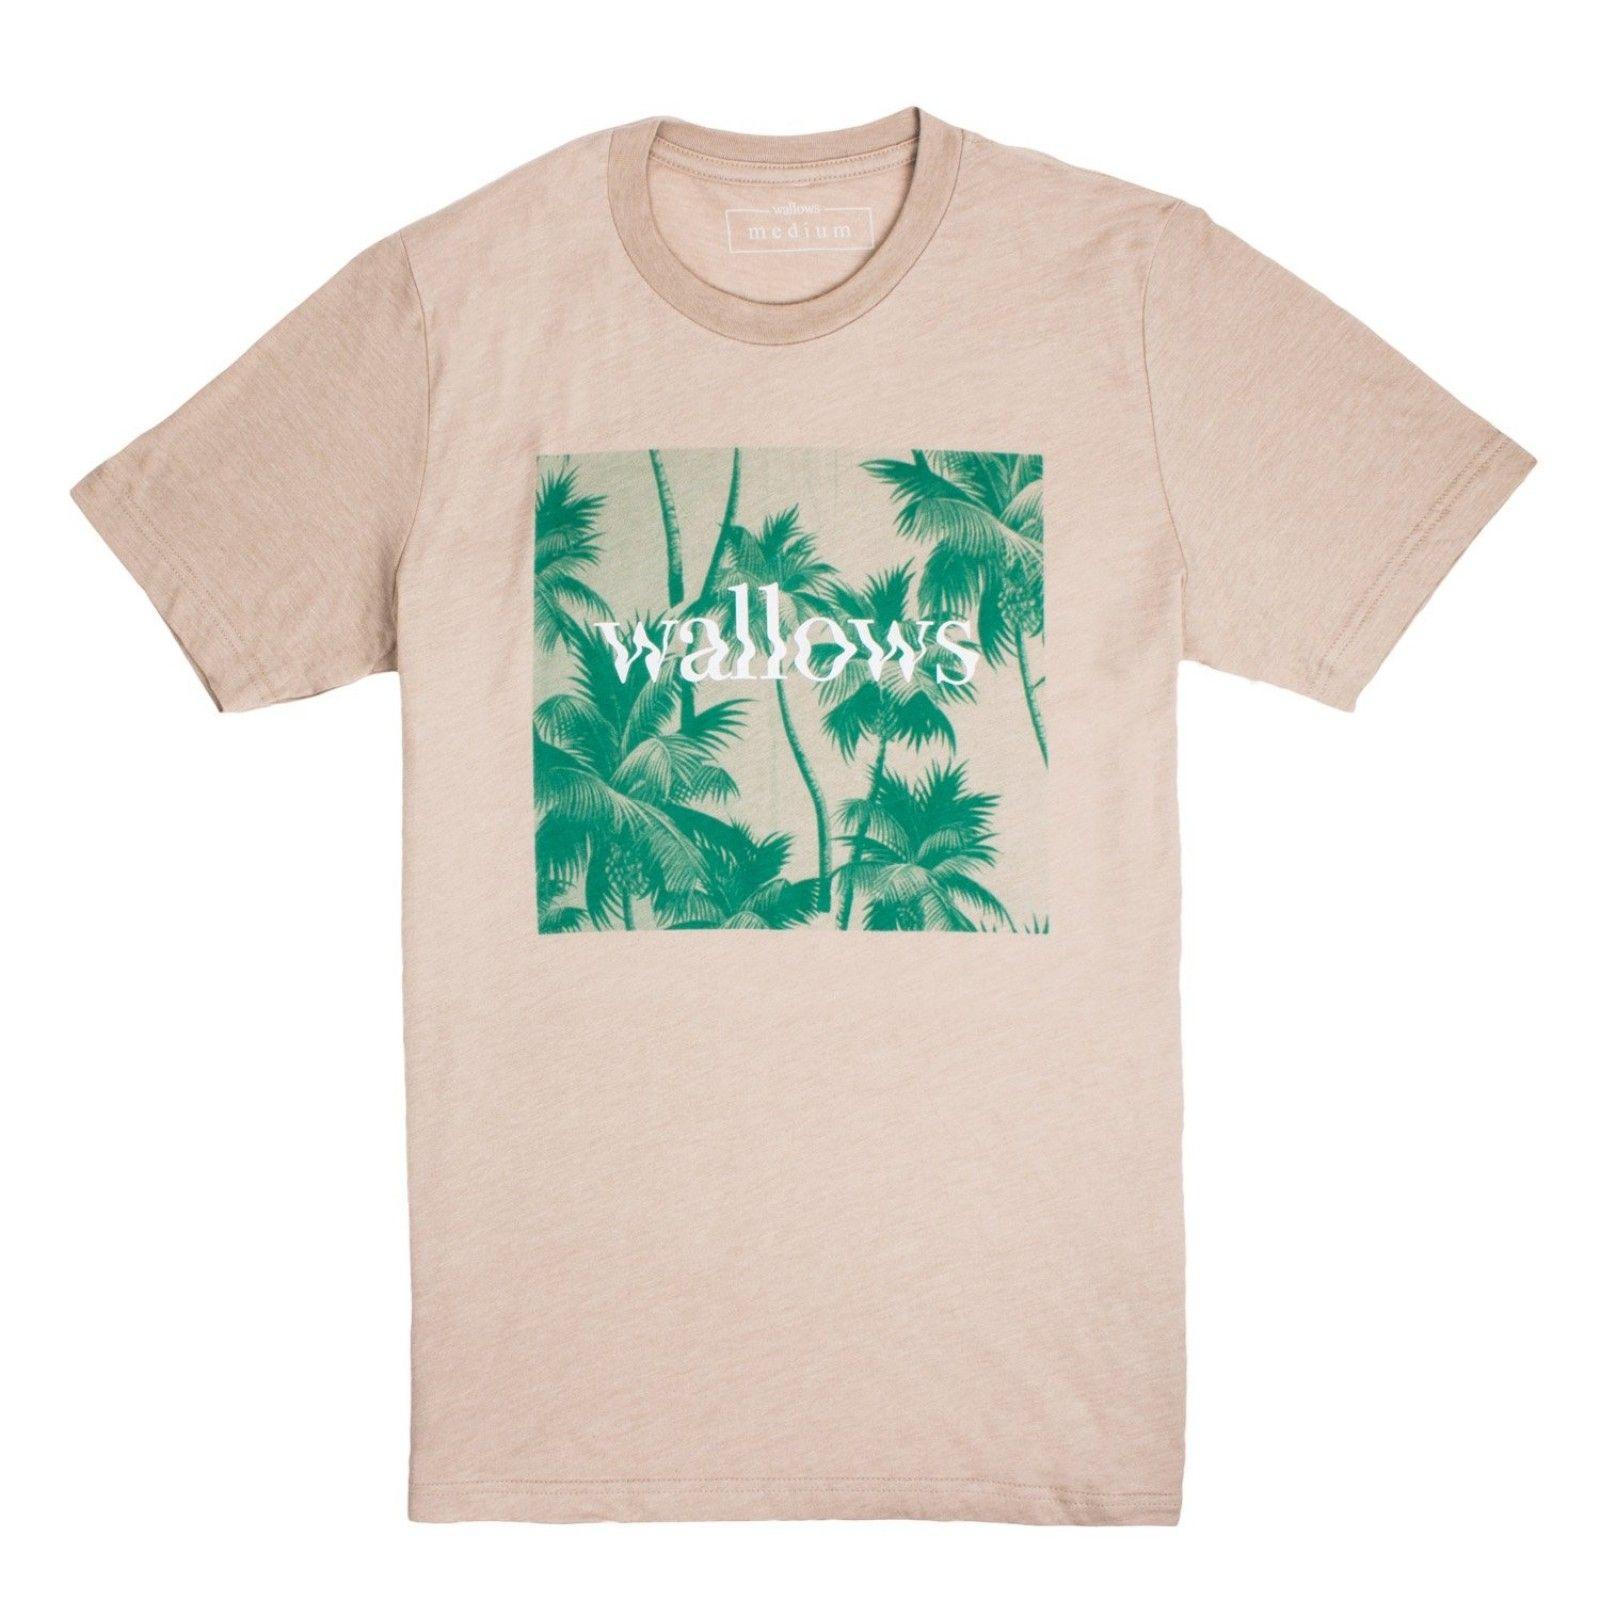 d491ac4a Wallows Palm Tree T-Shirt | Wallows in 2019 | Printed shirts, T ...